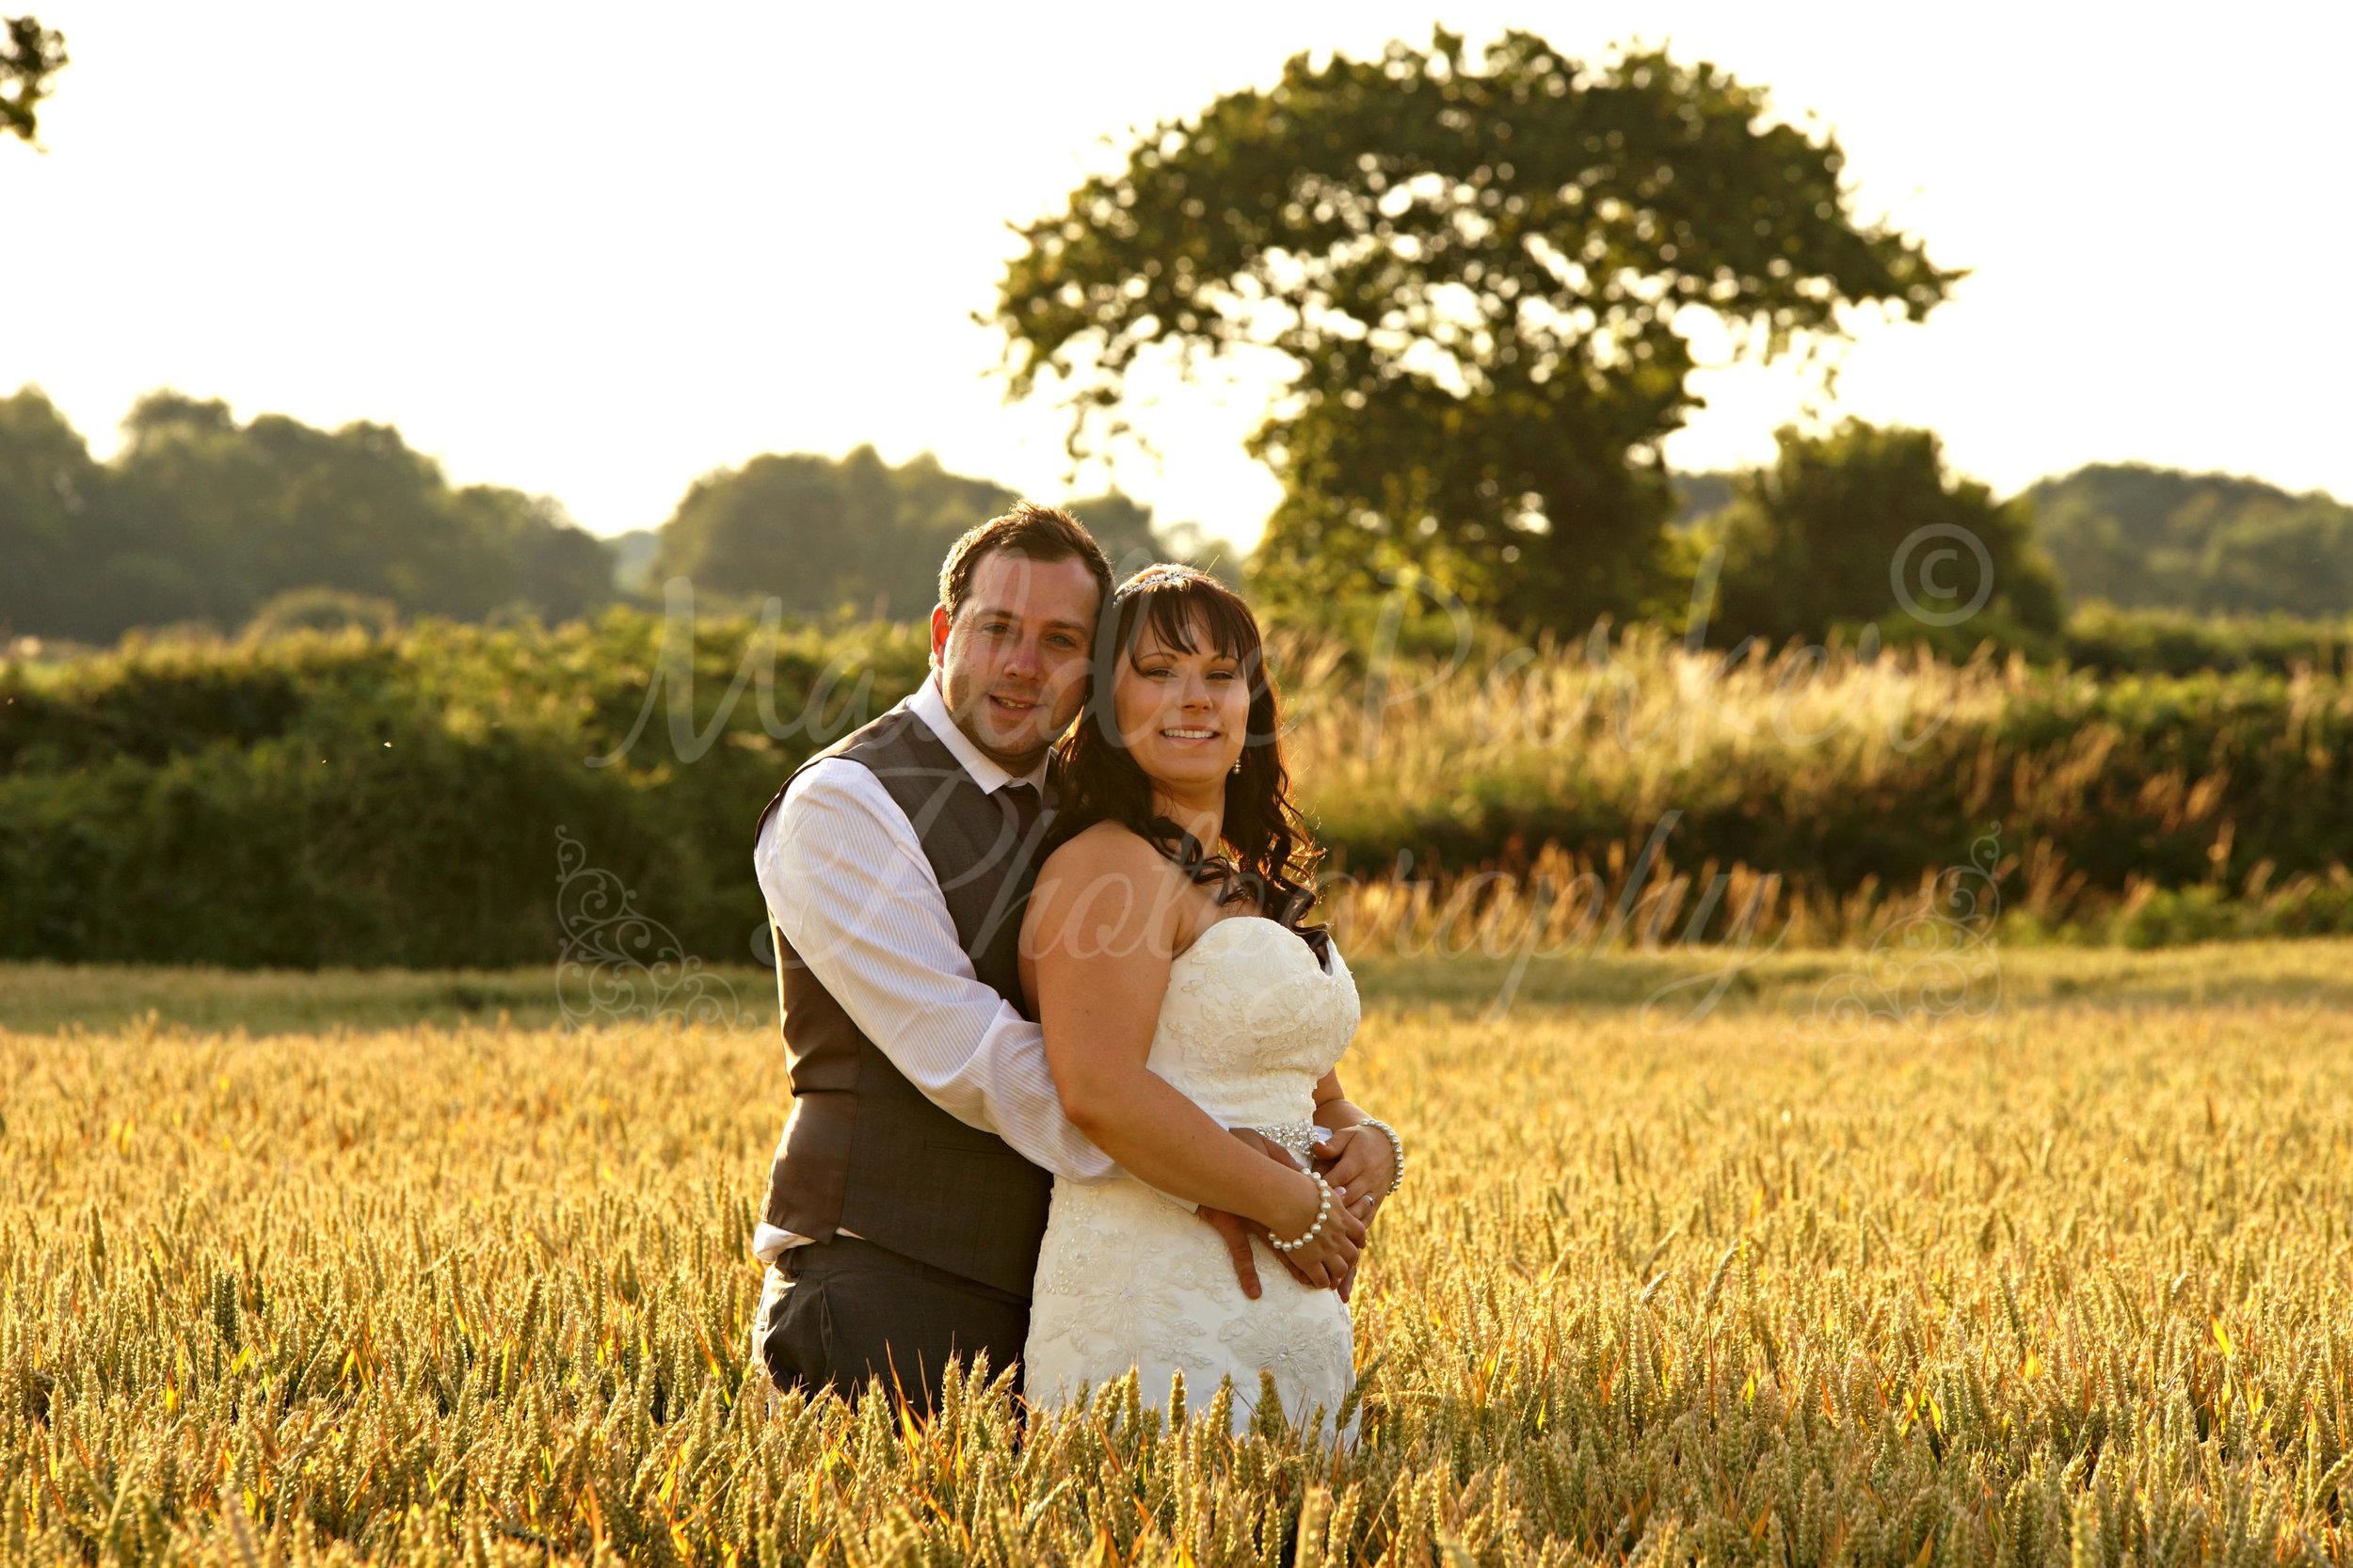 Michelle and Liam